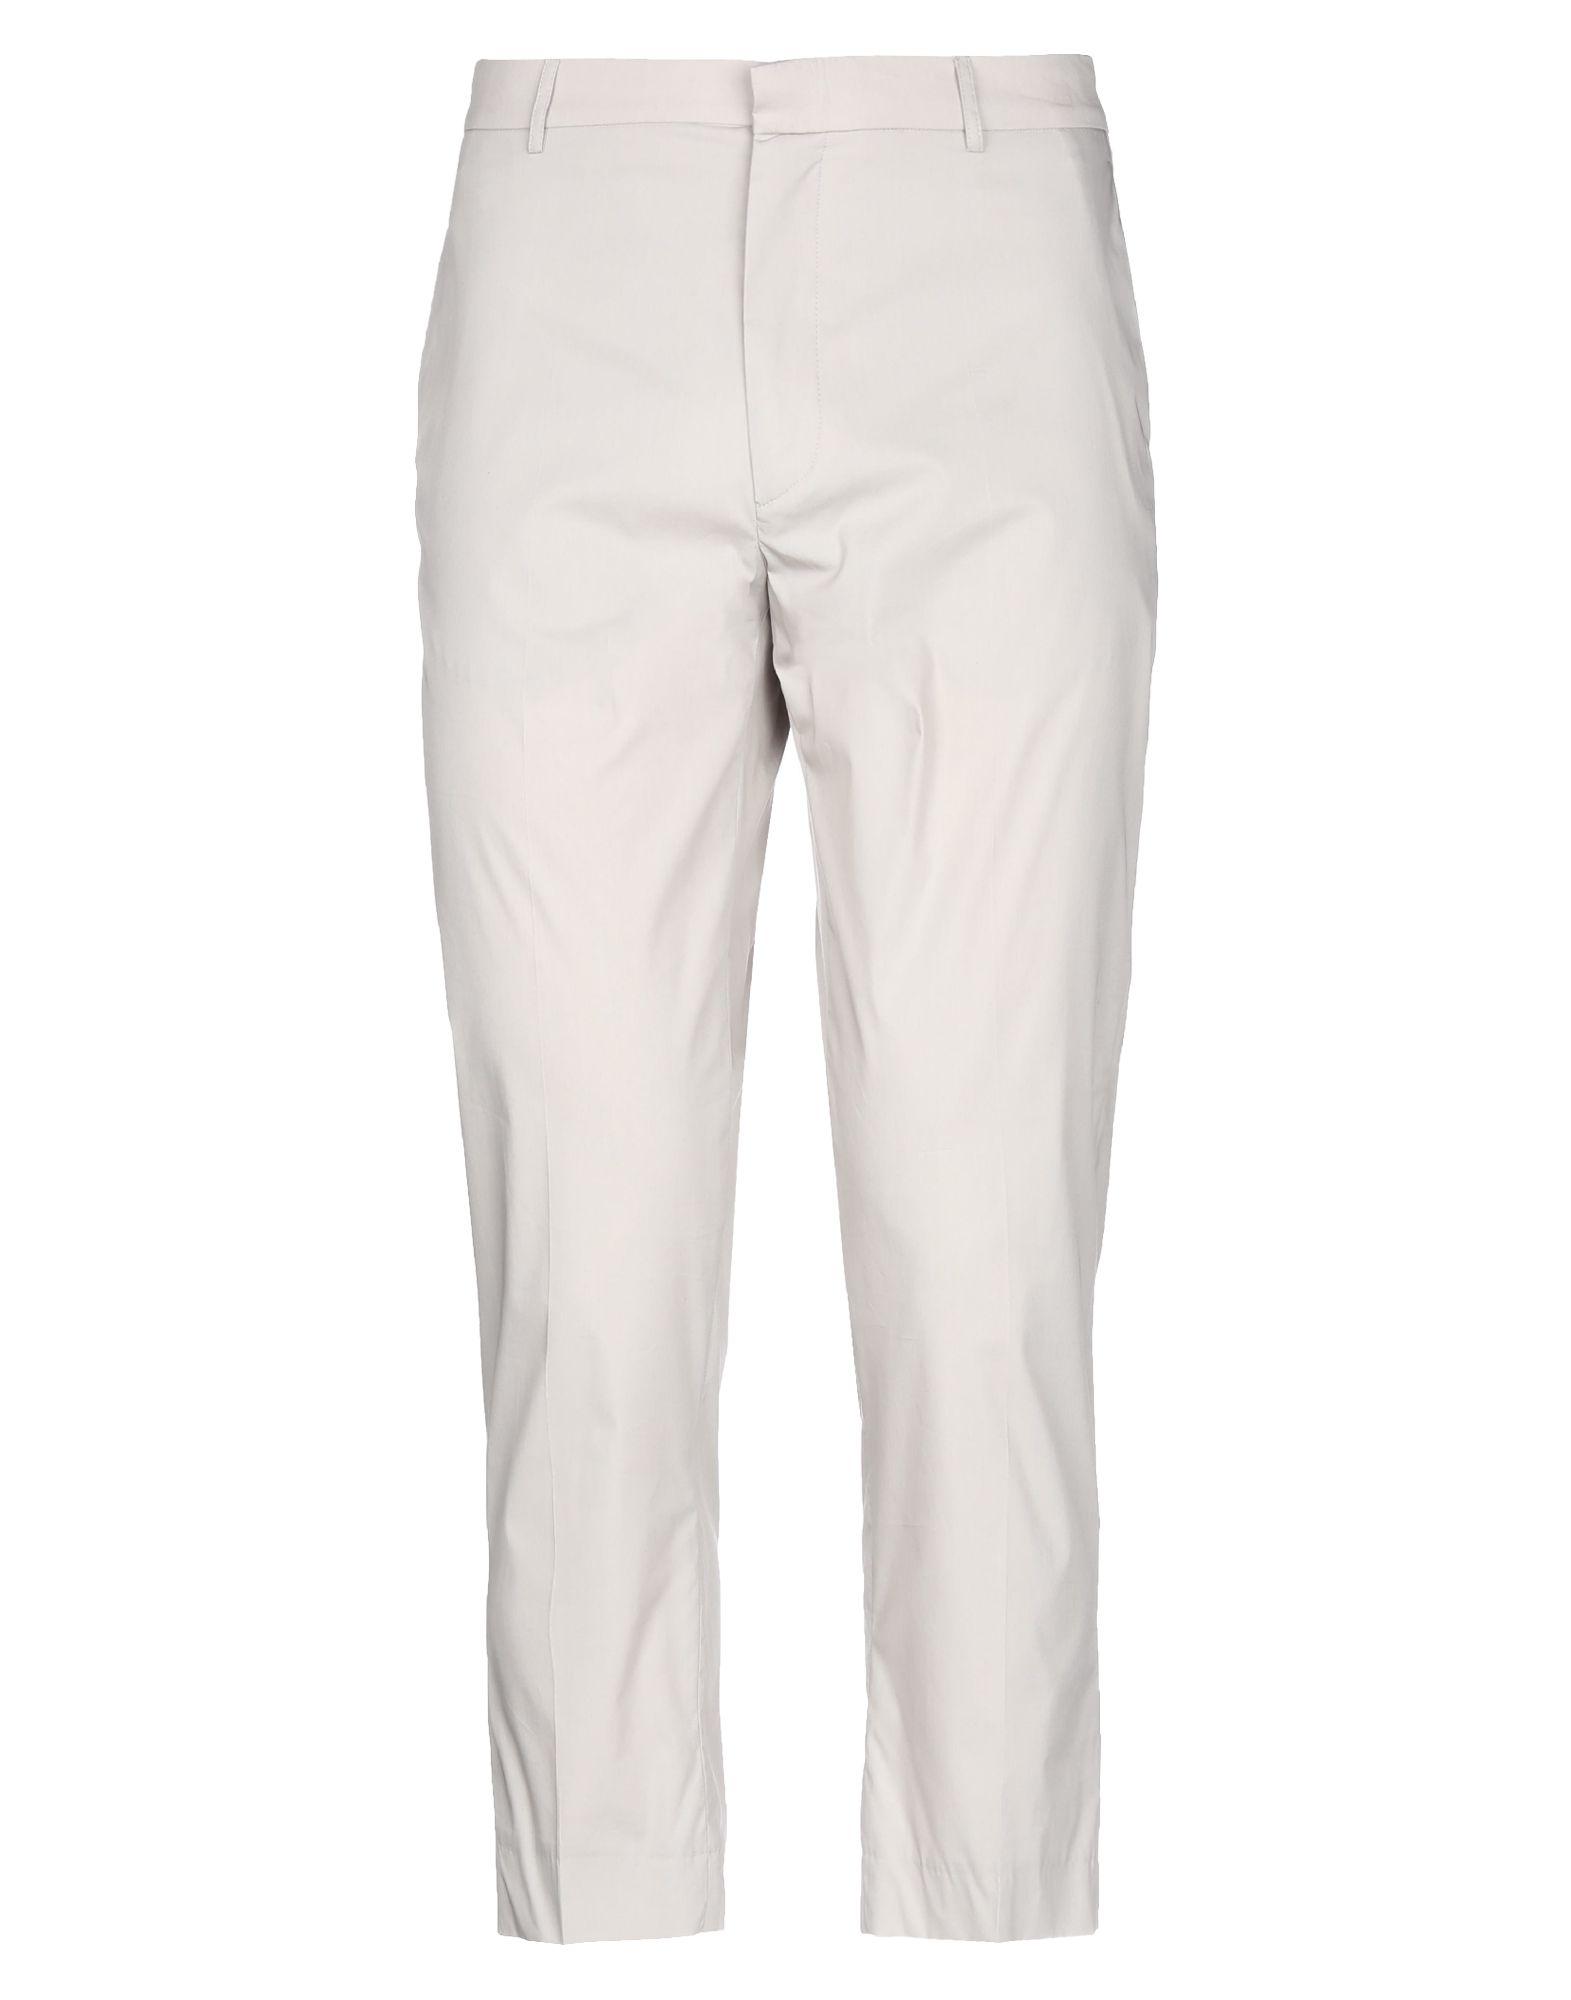 HARMONY Paris Повседневные брюки набор простыней micuna harmony single и harmony plus 120 60 2шт тх 1759 white pink